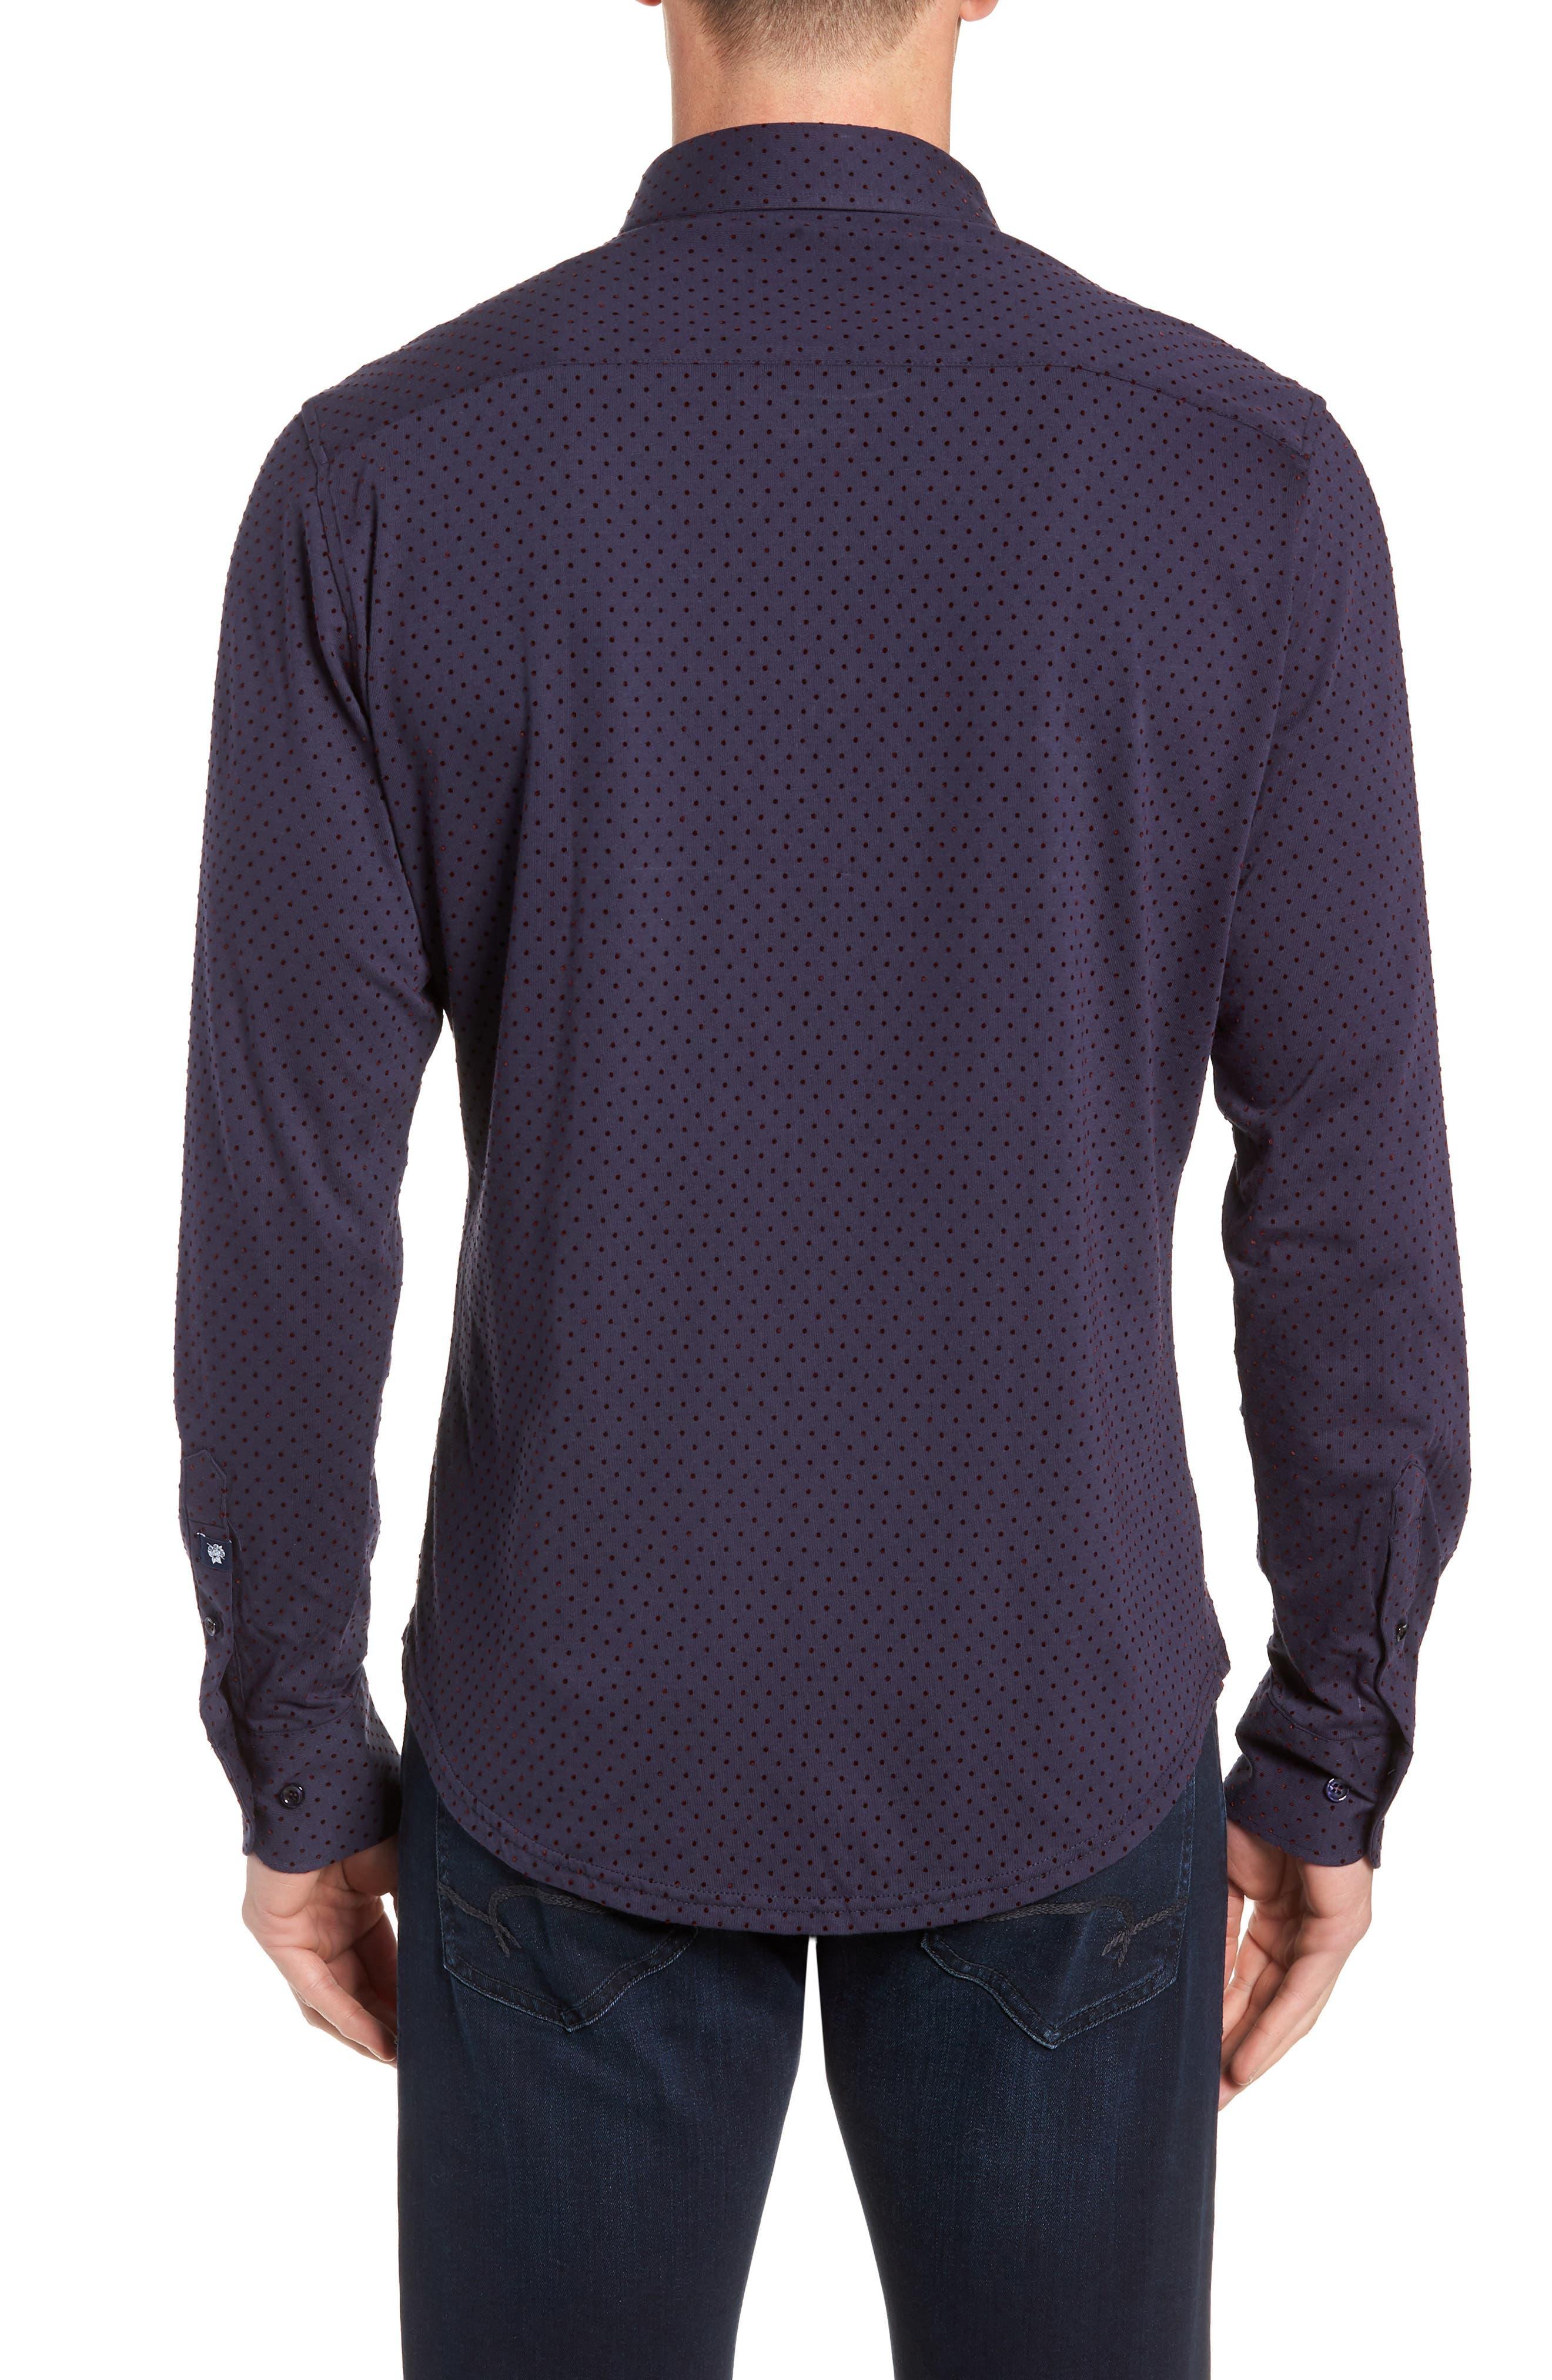 STONE ROSE,                             Regular Fit Knit Sport Shirt,                             Alternate thumbnail 3, color,                             NAVY